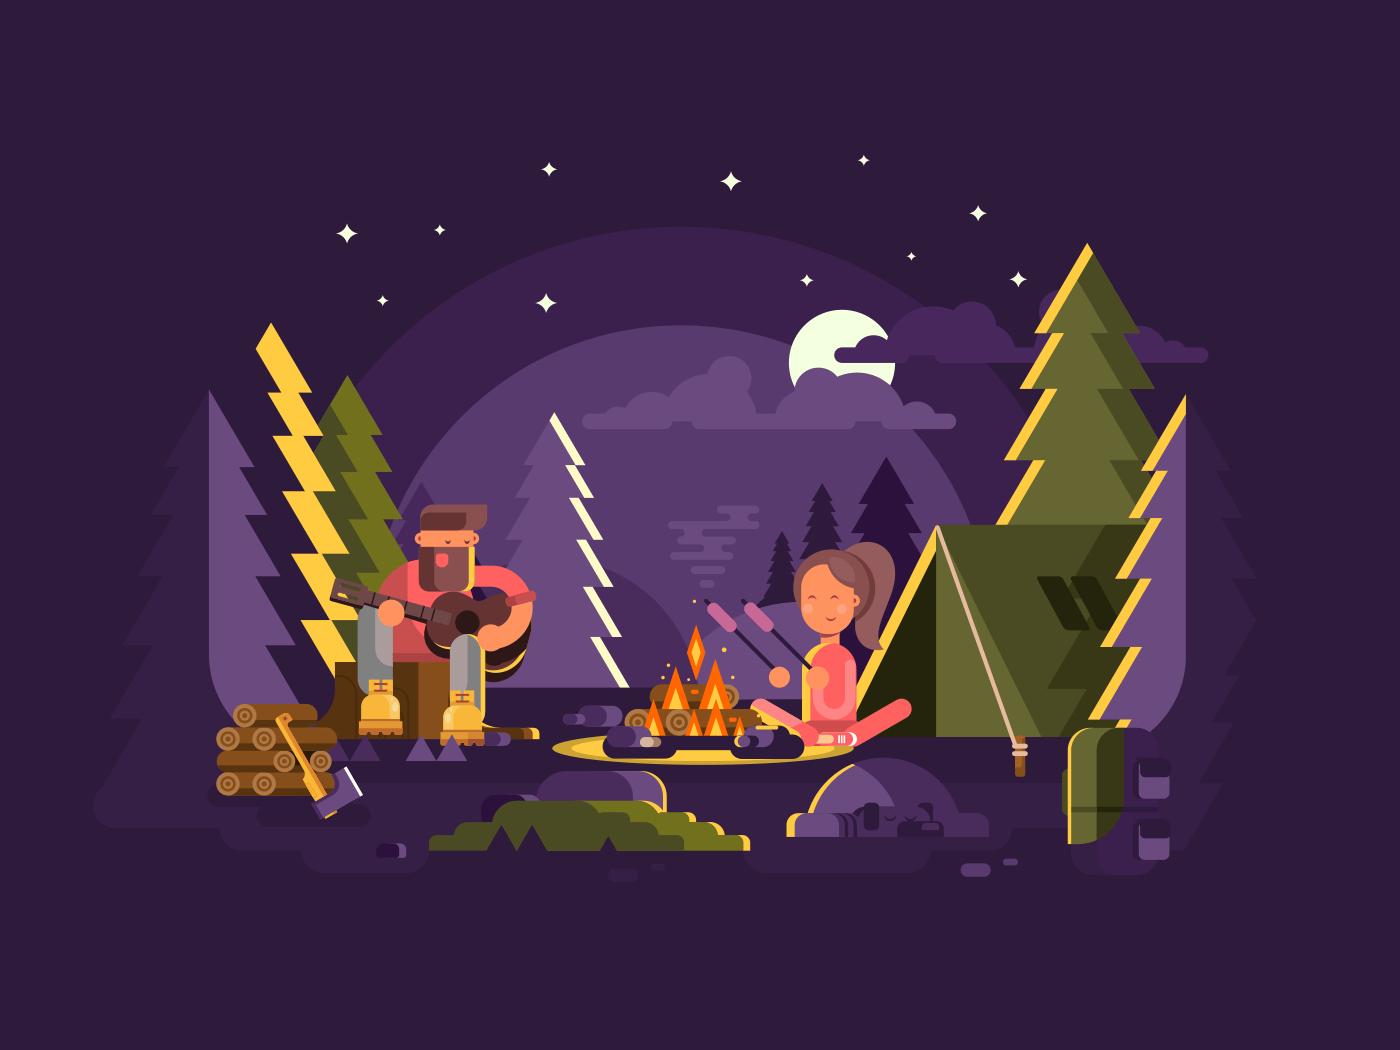 Camp near a fire flat vector illustration